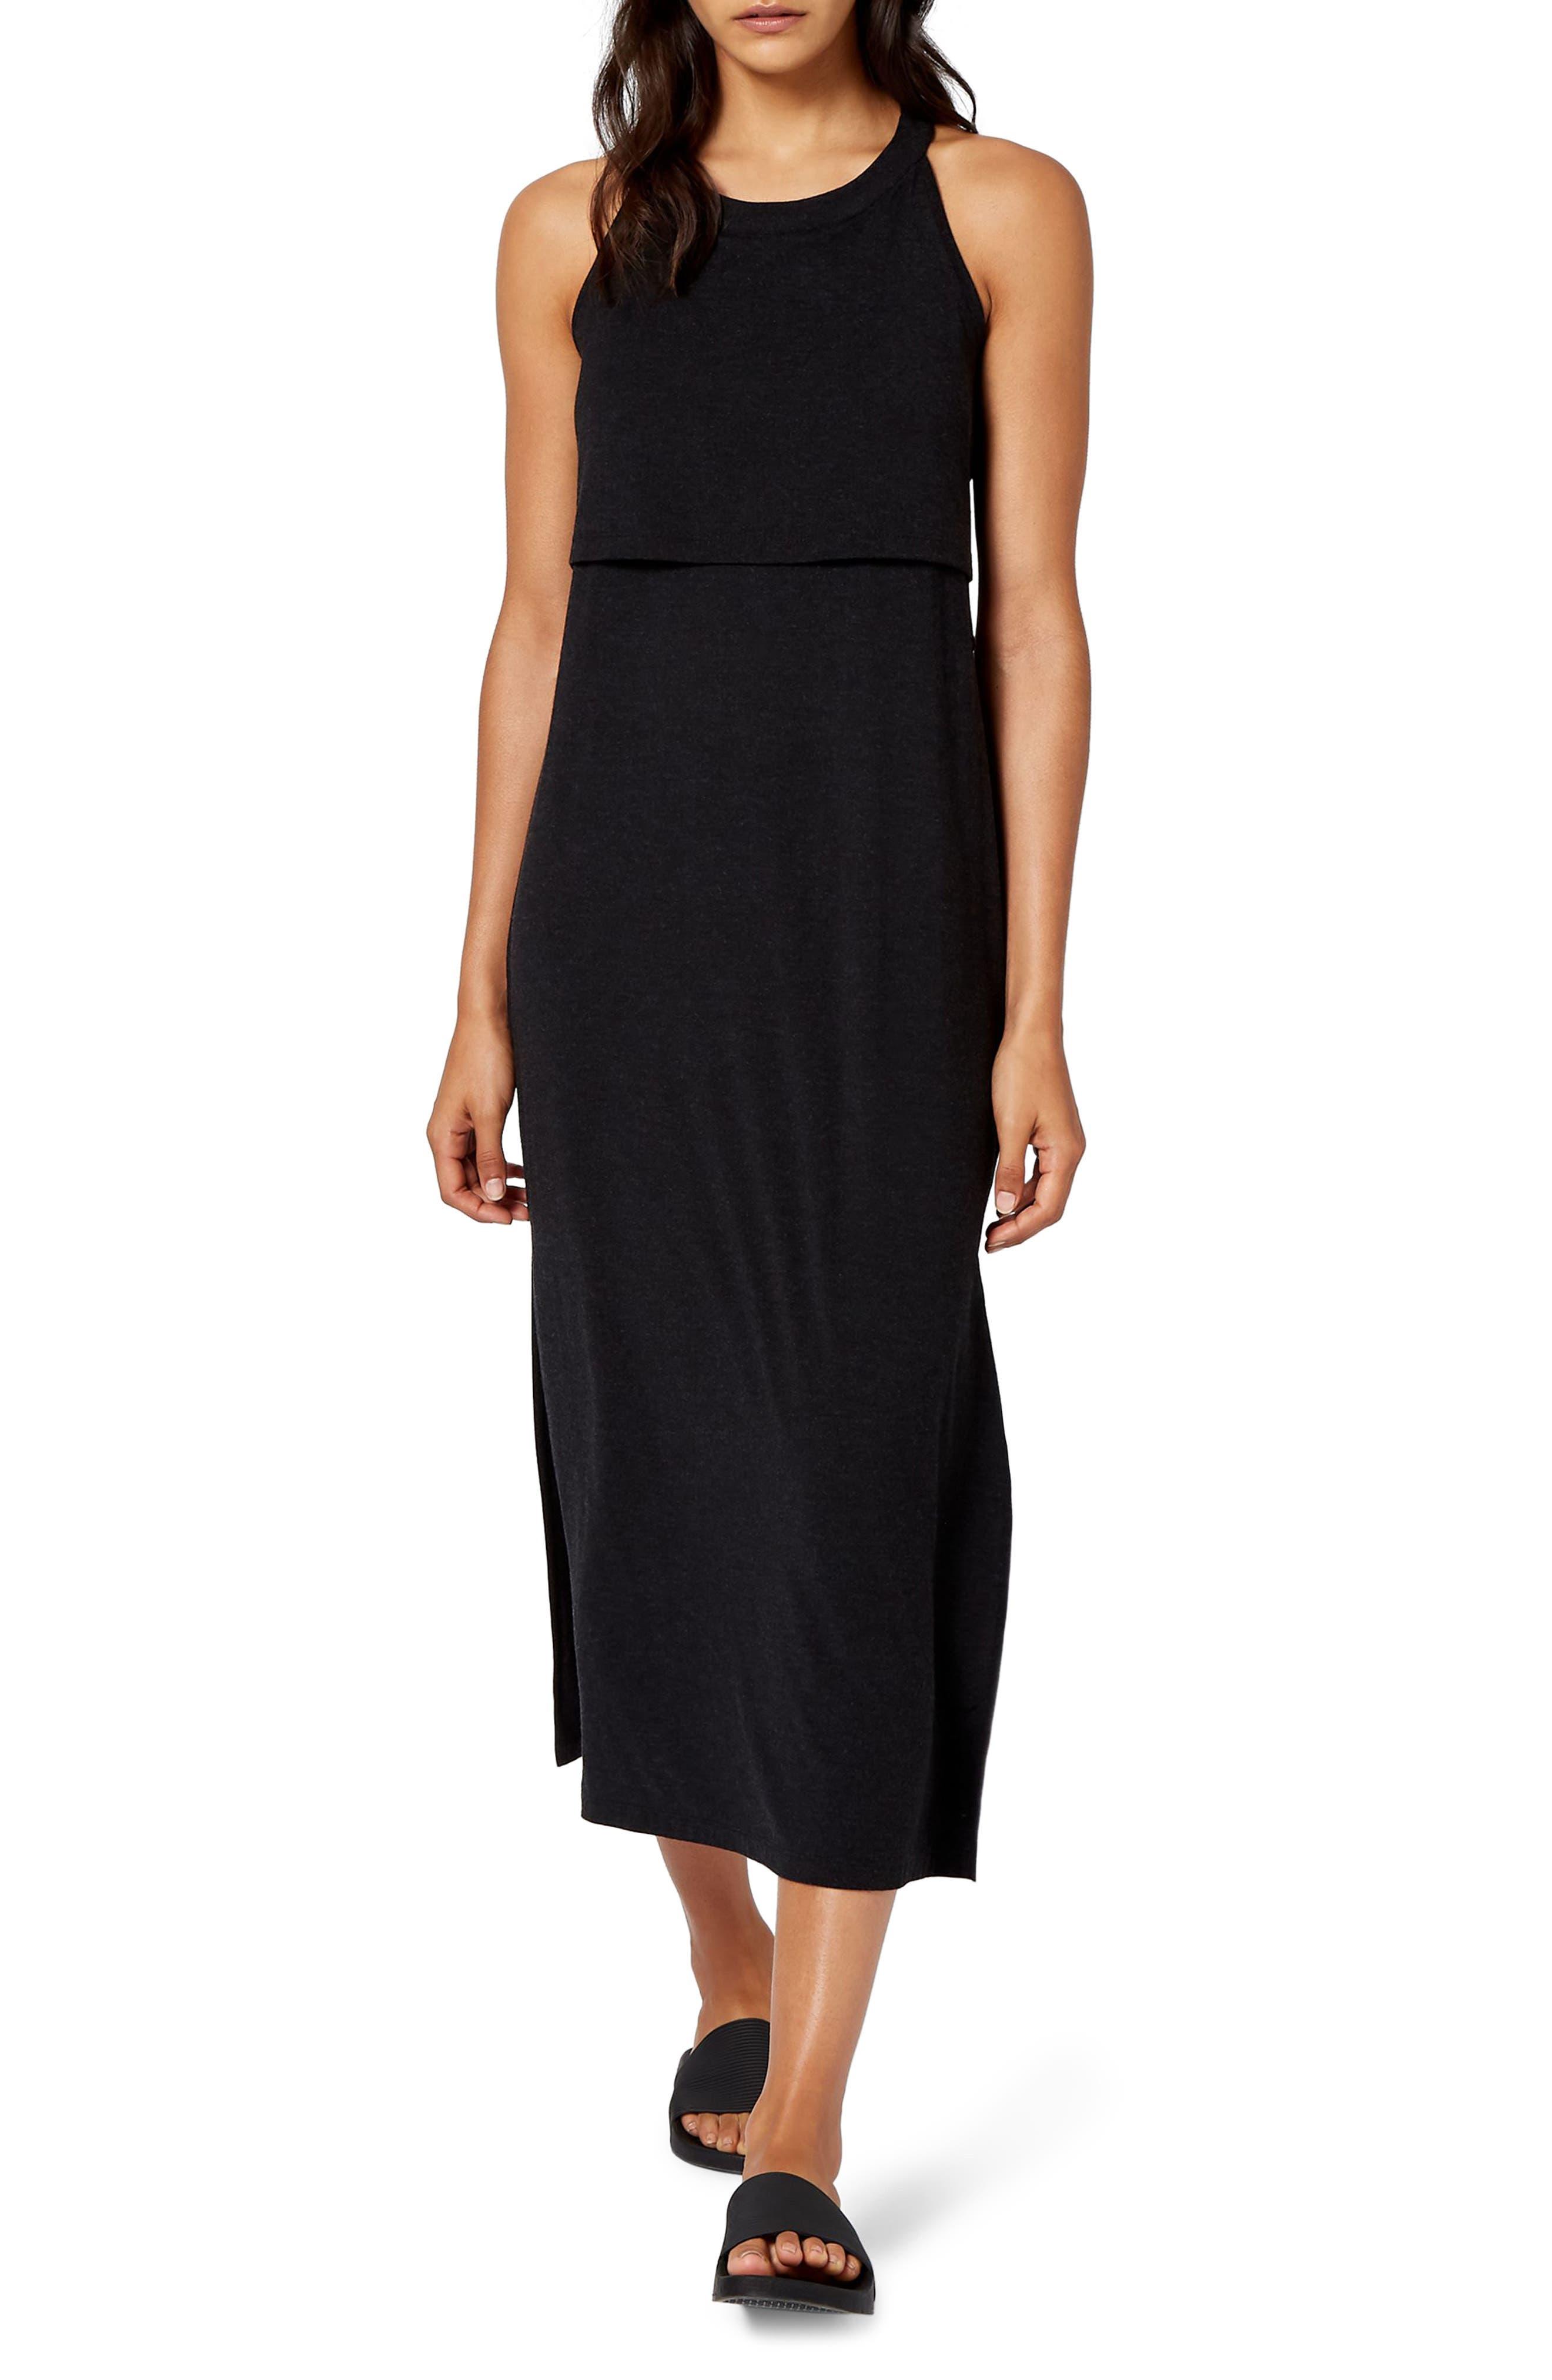 Holistic Dress,                         Main,                         color, BLACK MARL